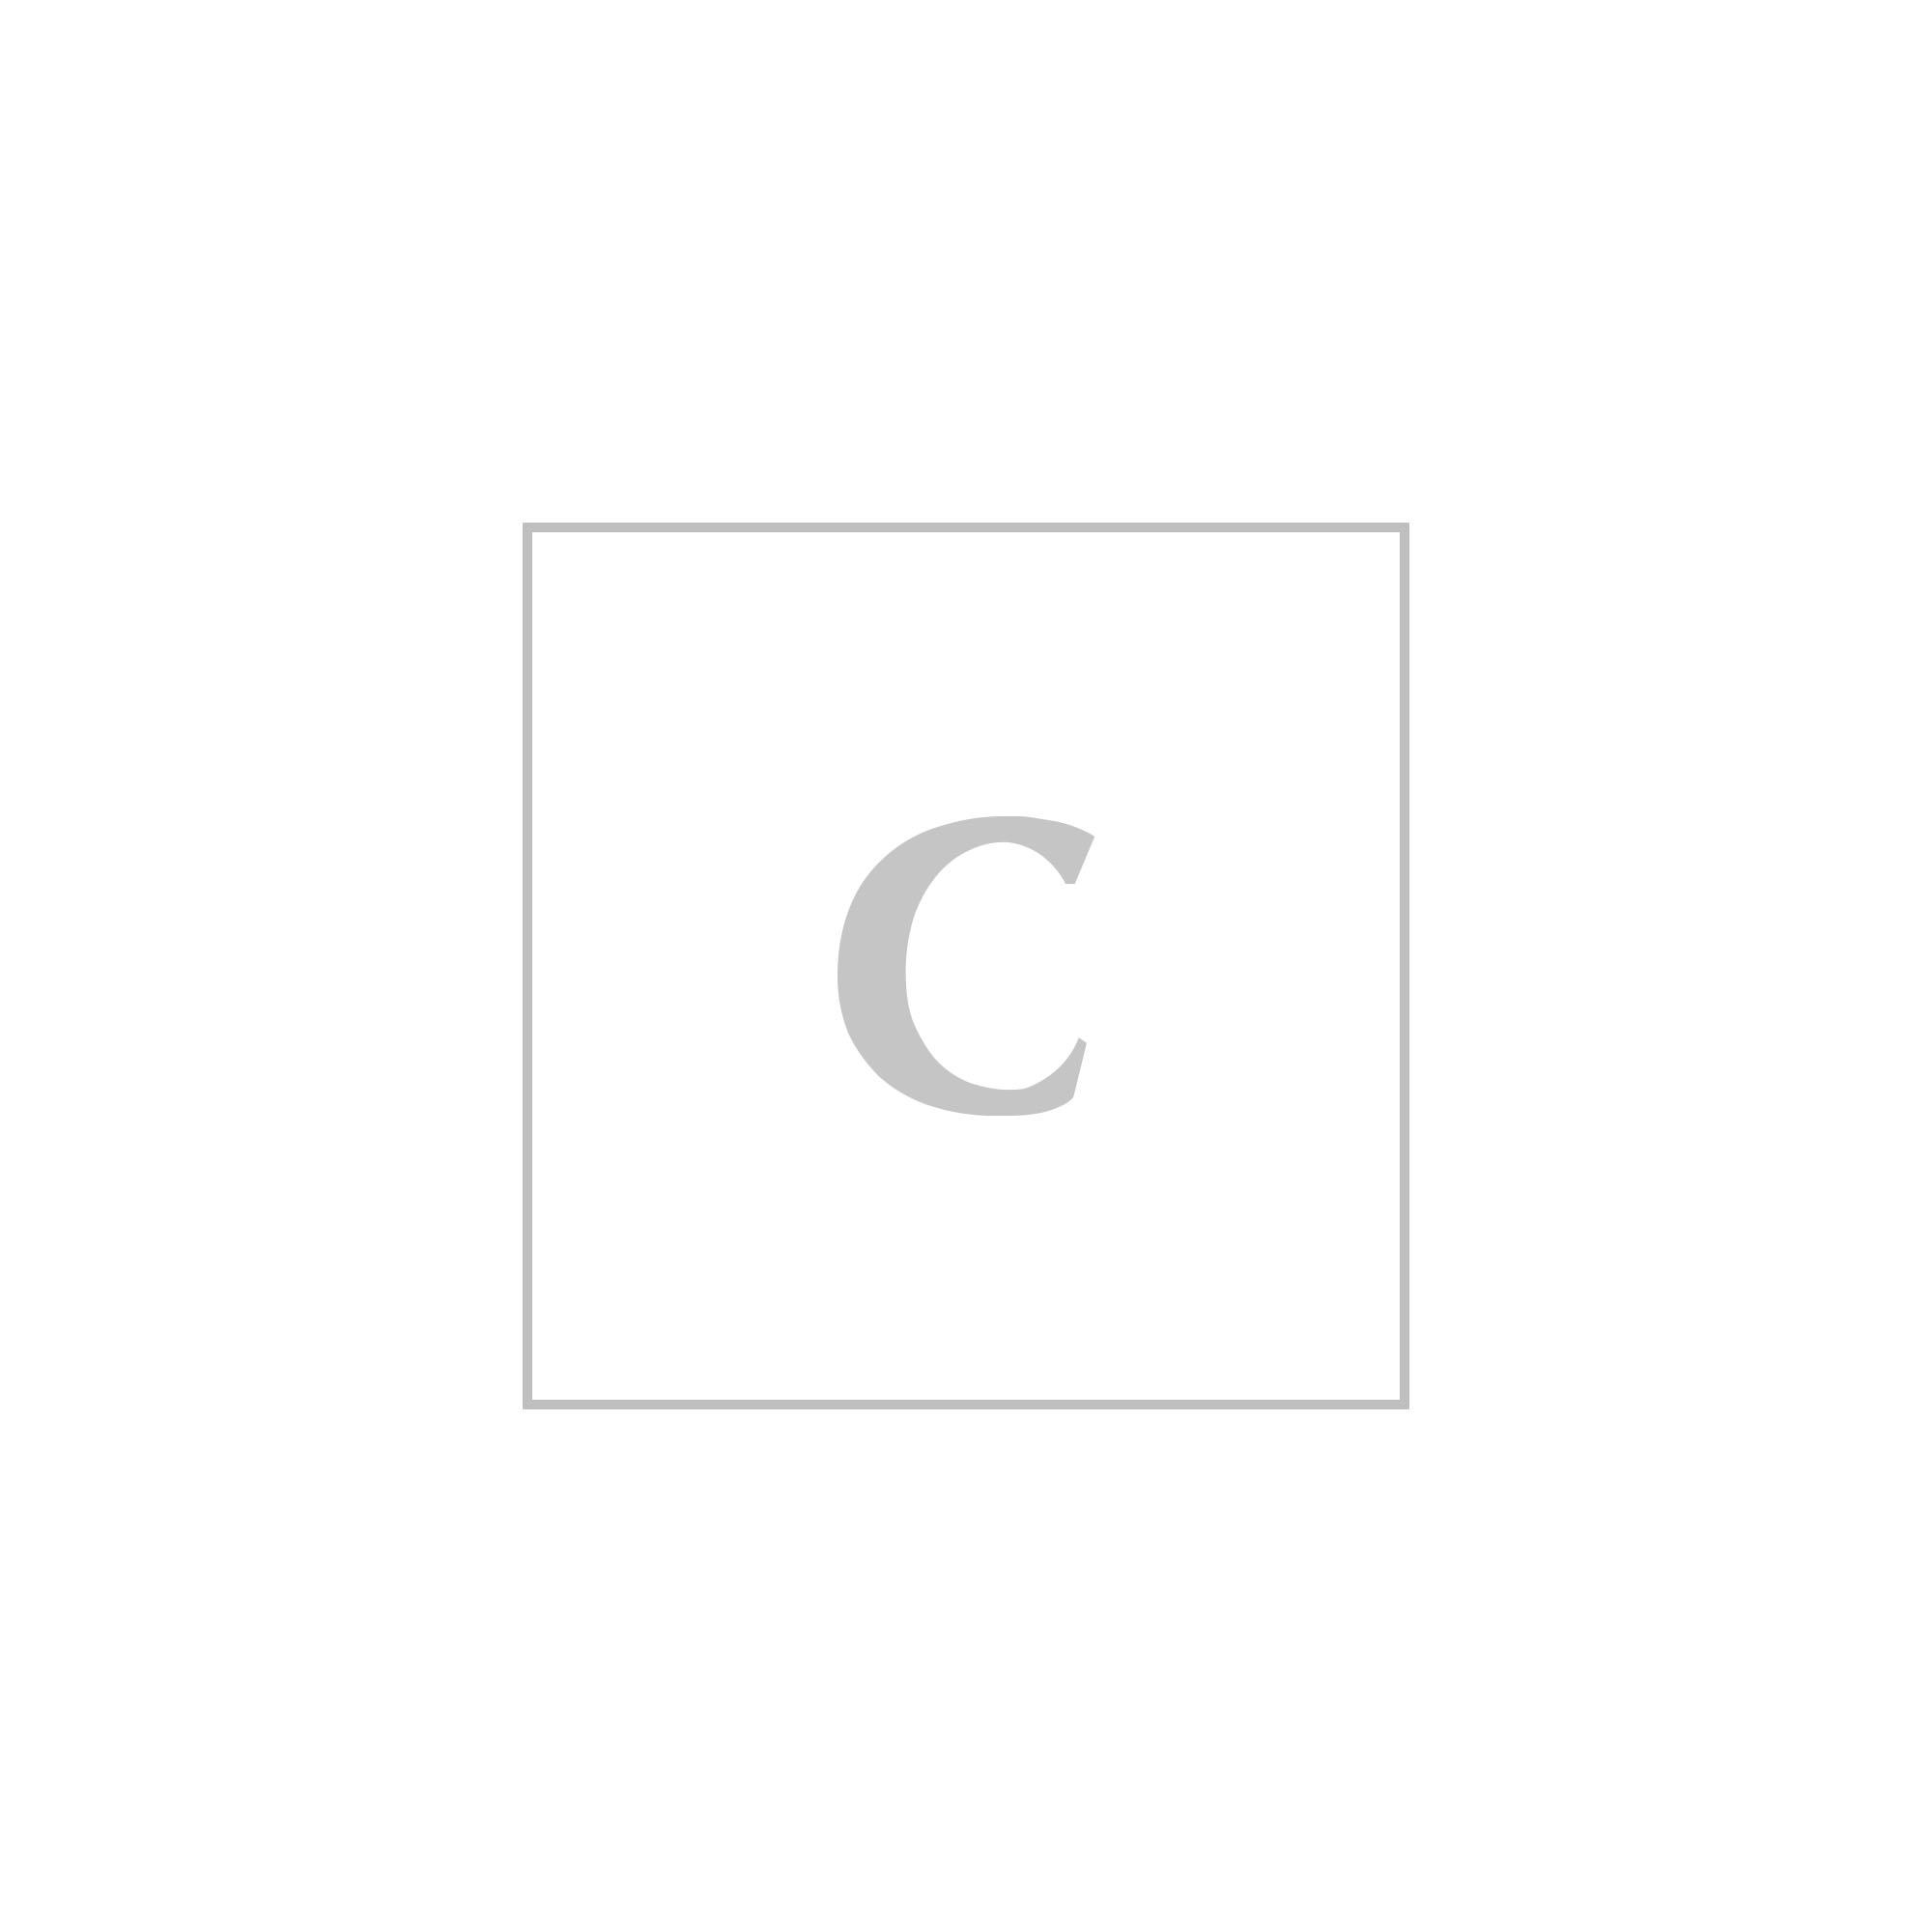 Dolce & gabbana carretto print cardholder